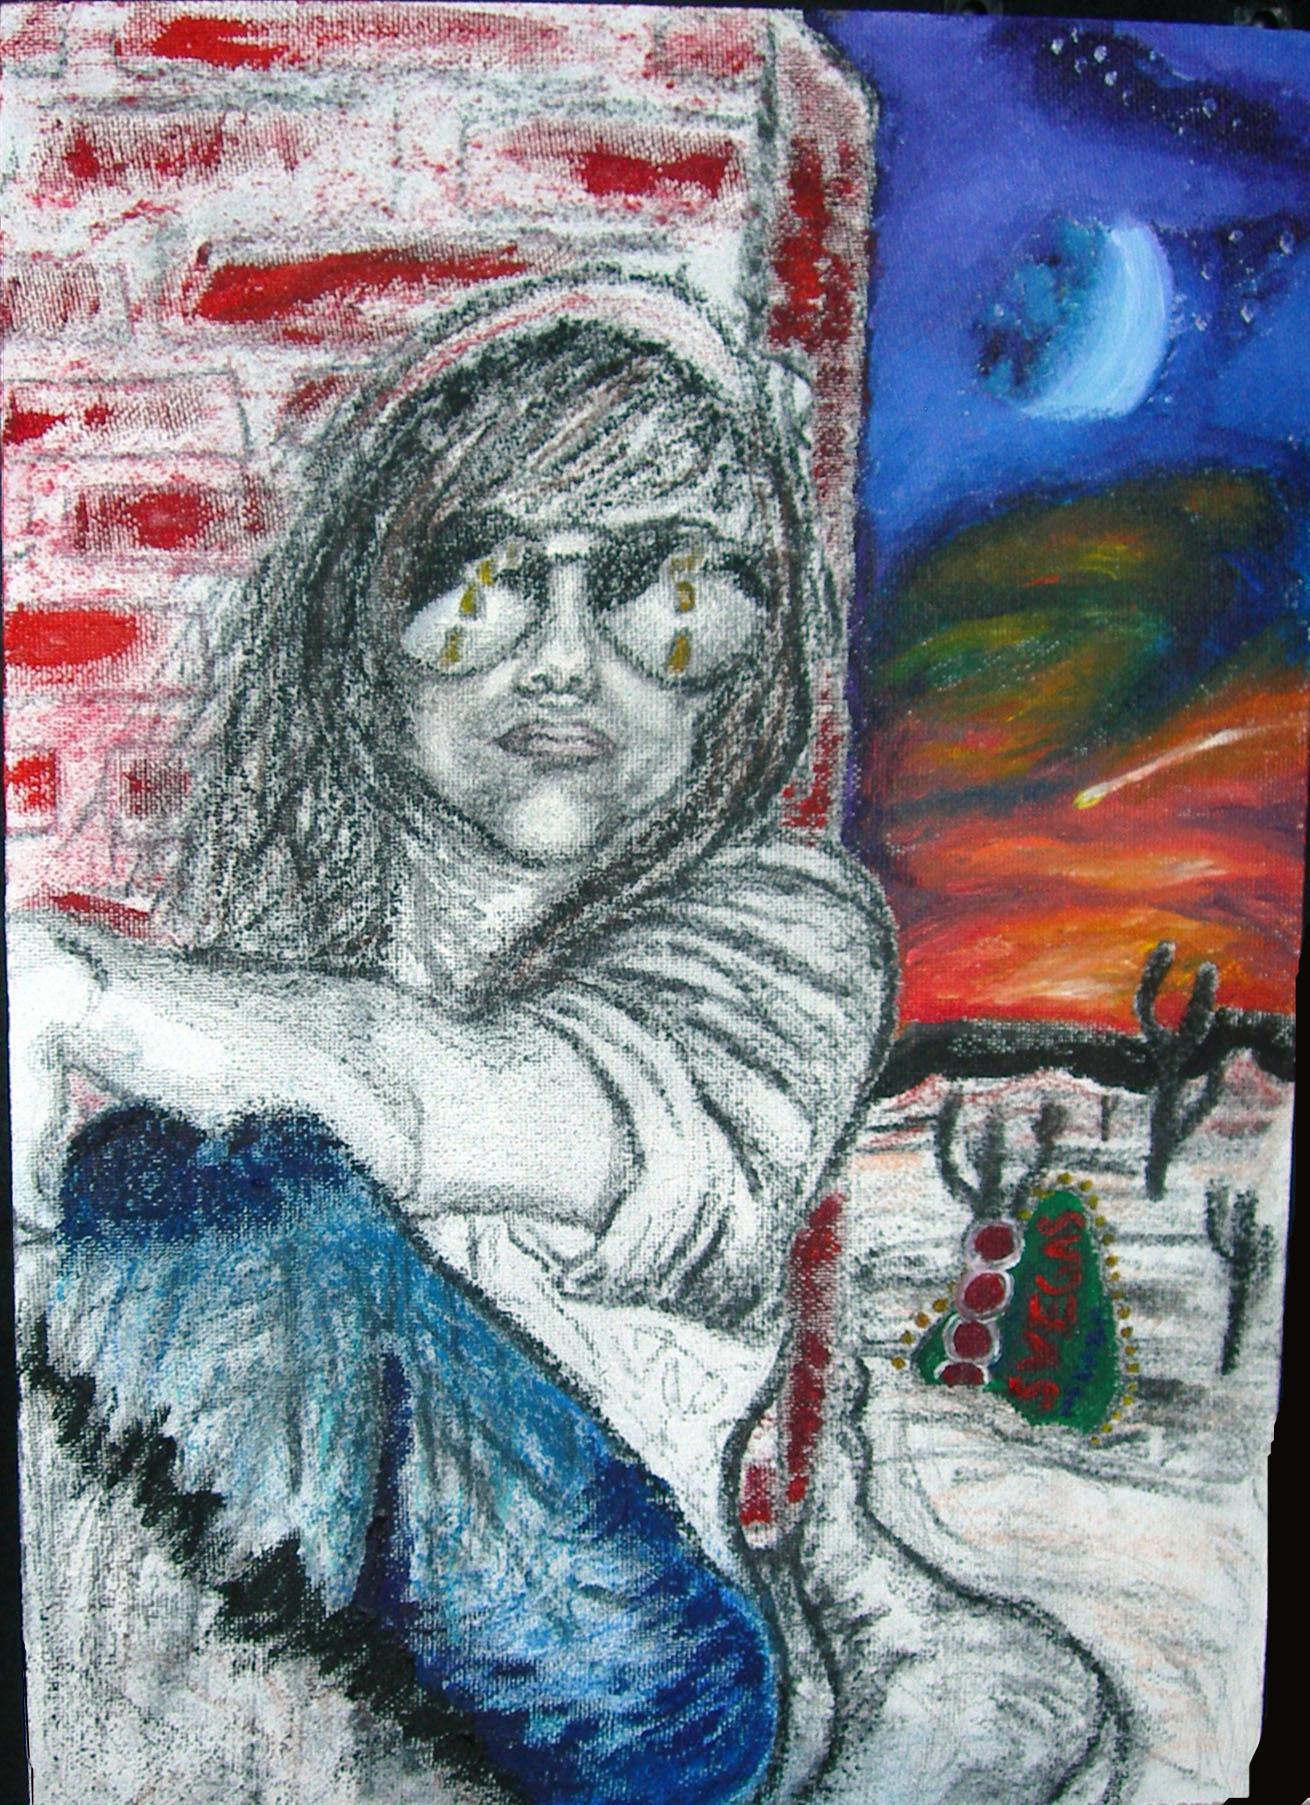 fear and eloping in las vegas by kathween513